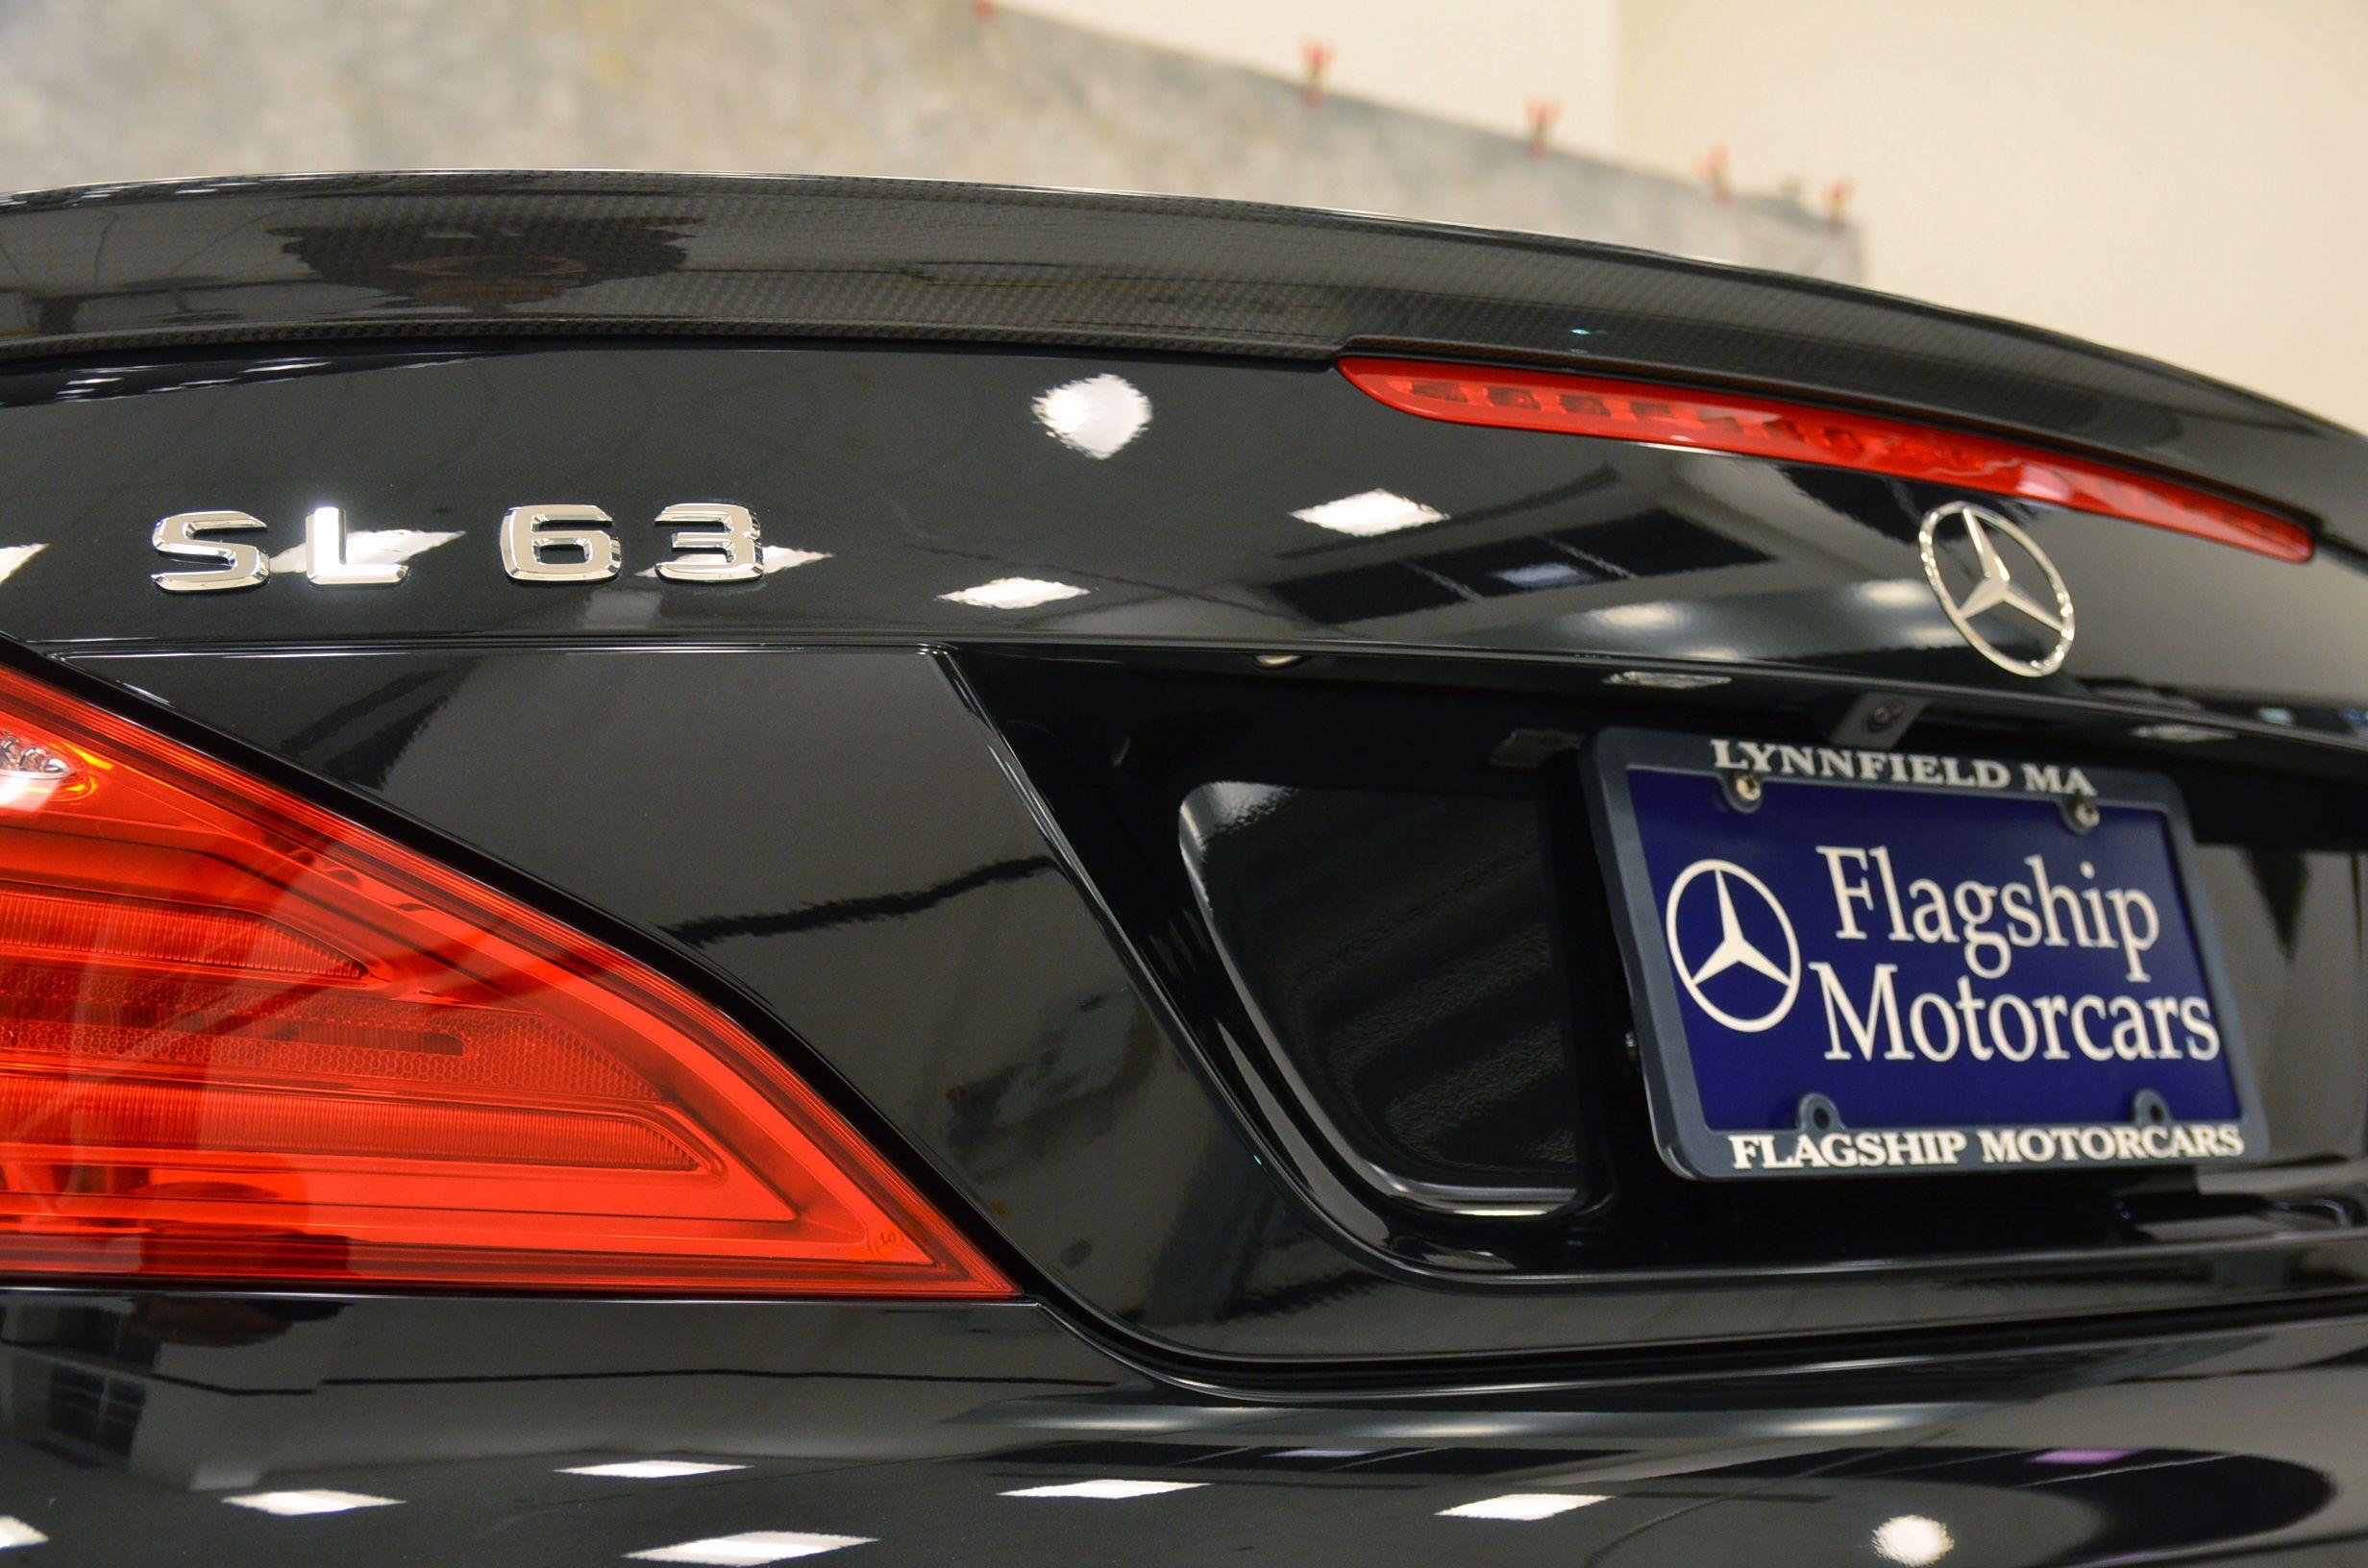 2013 Mercedes Benz SL63 AMG Roadster at Flagship Motorcars of